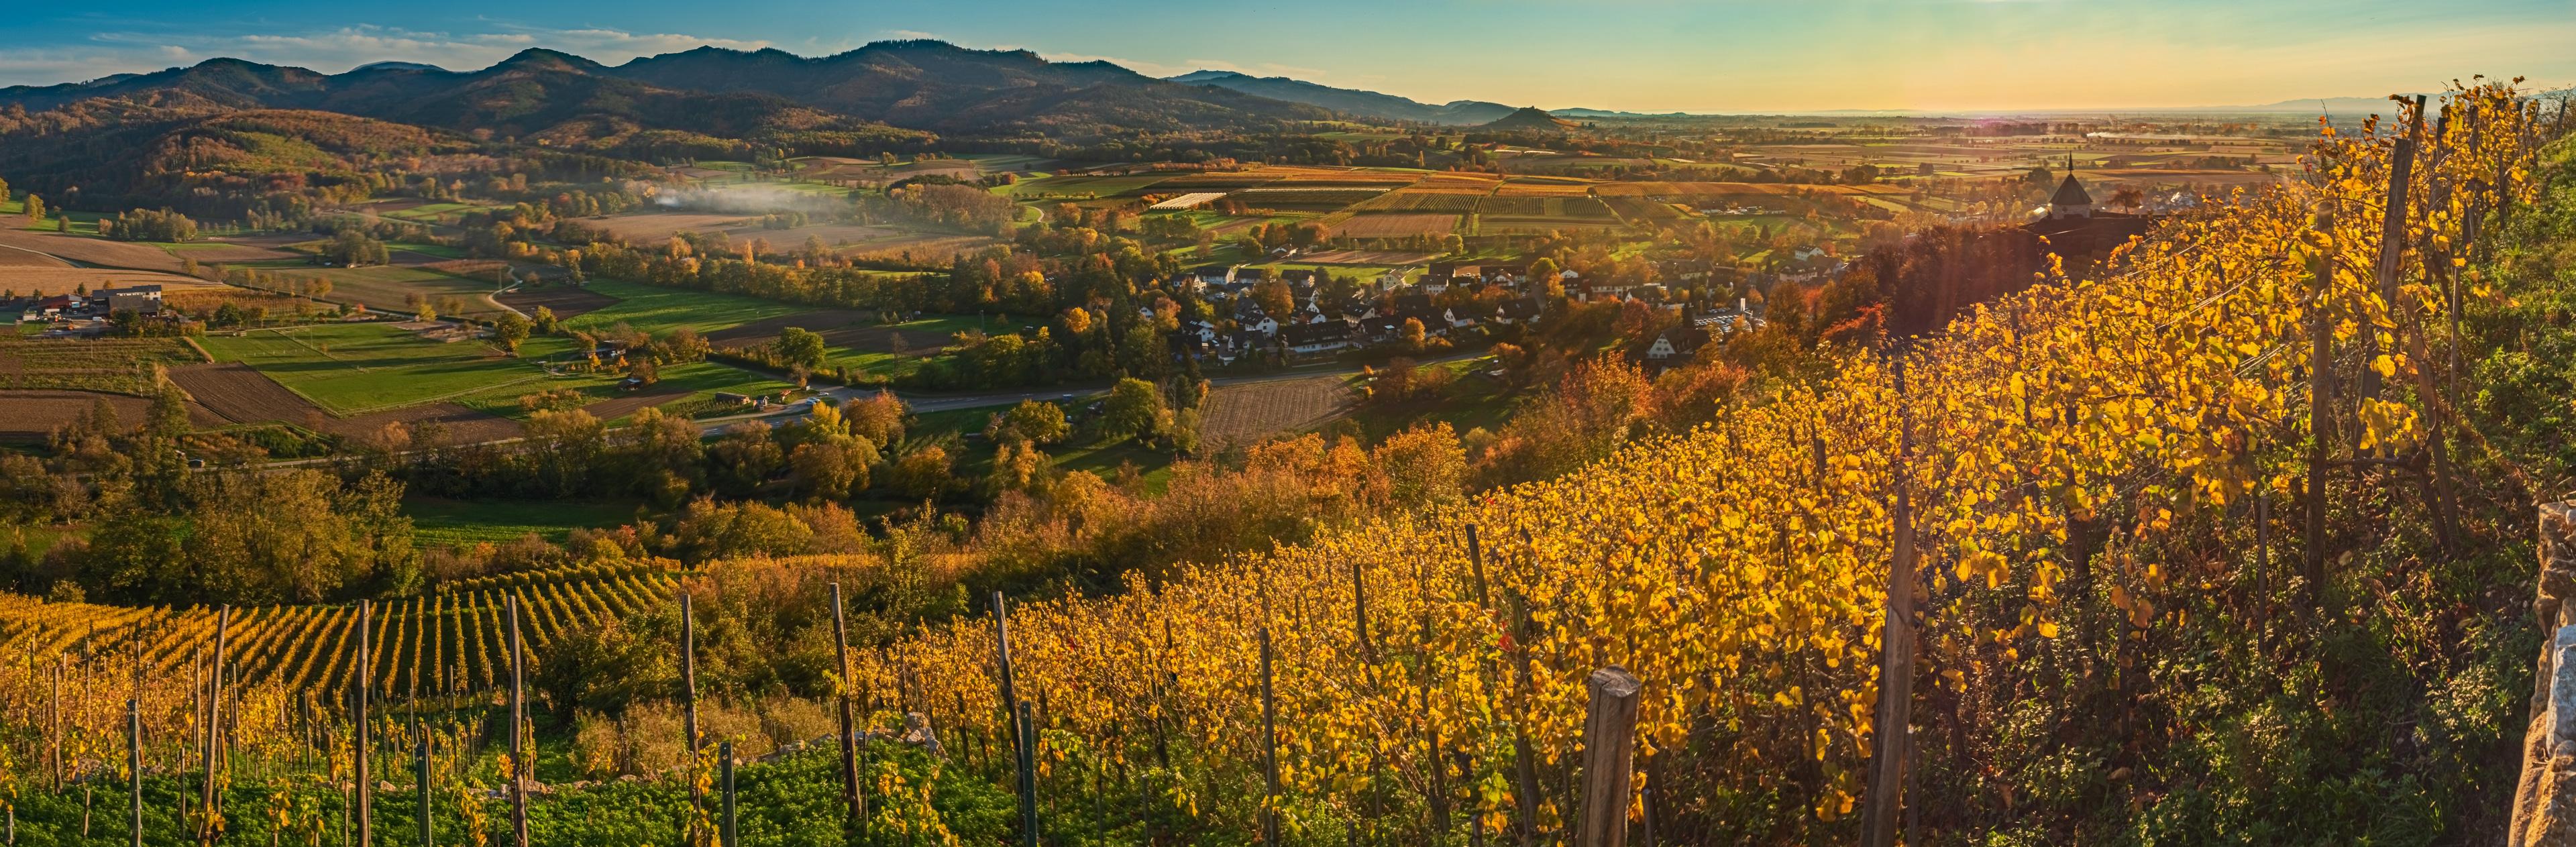 Sonnenuntergang im Herbst bei der Ölberg Kapelle